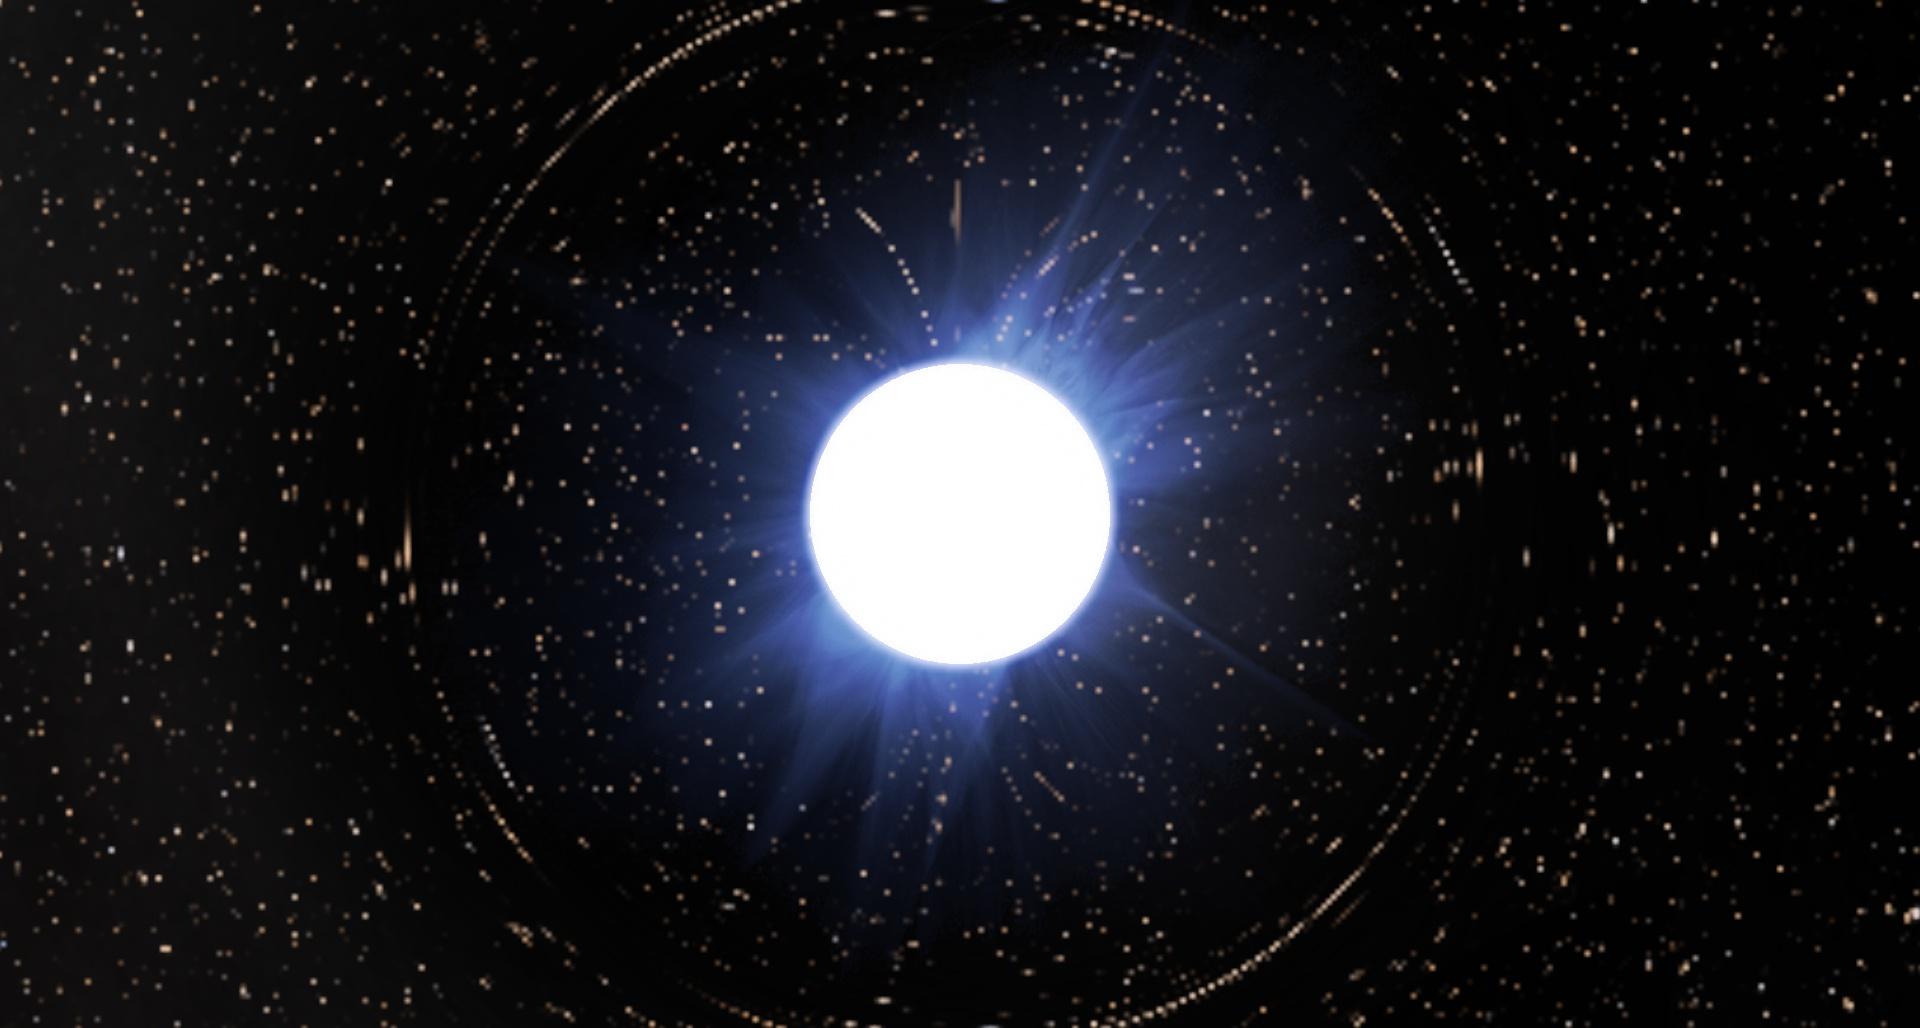 neutron star definition - HD1920×1028